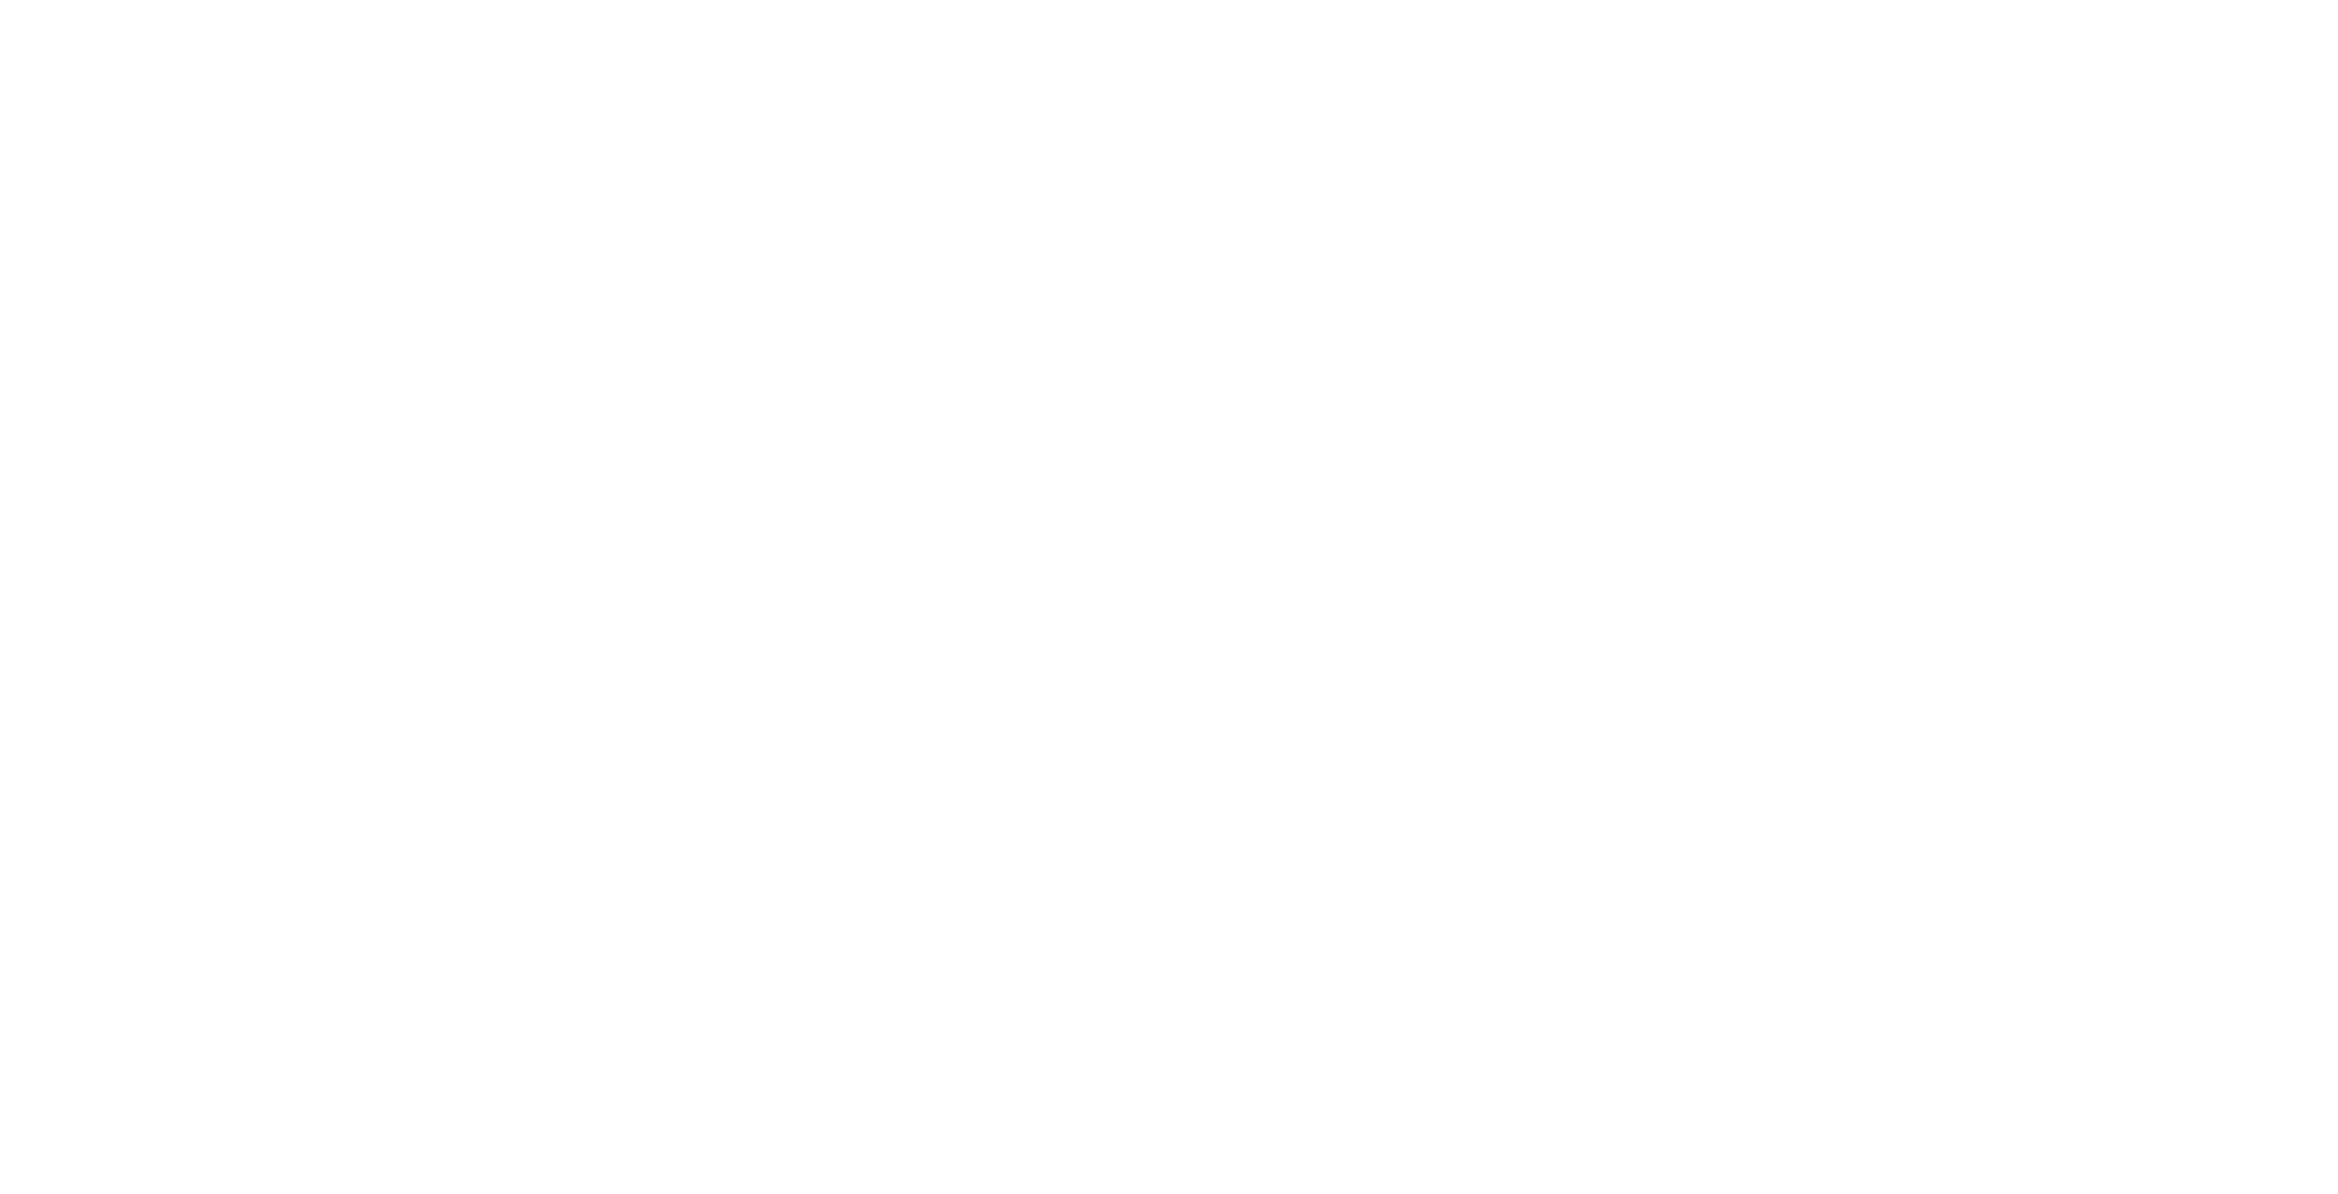 Edwin & Associates